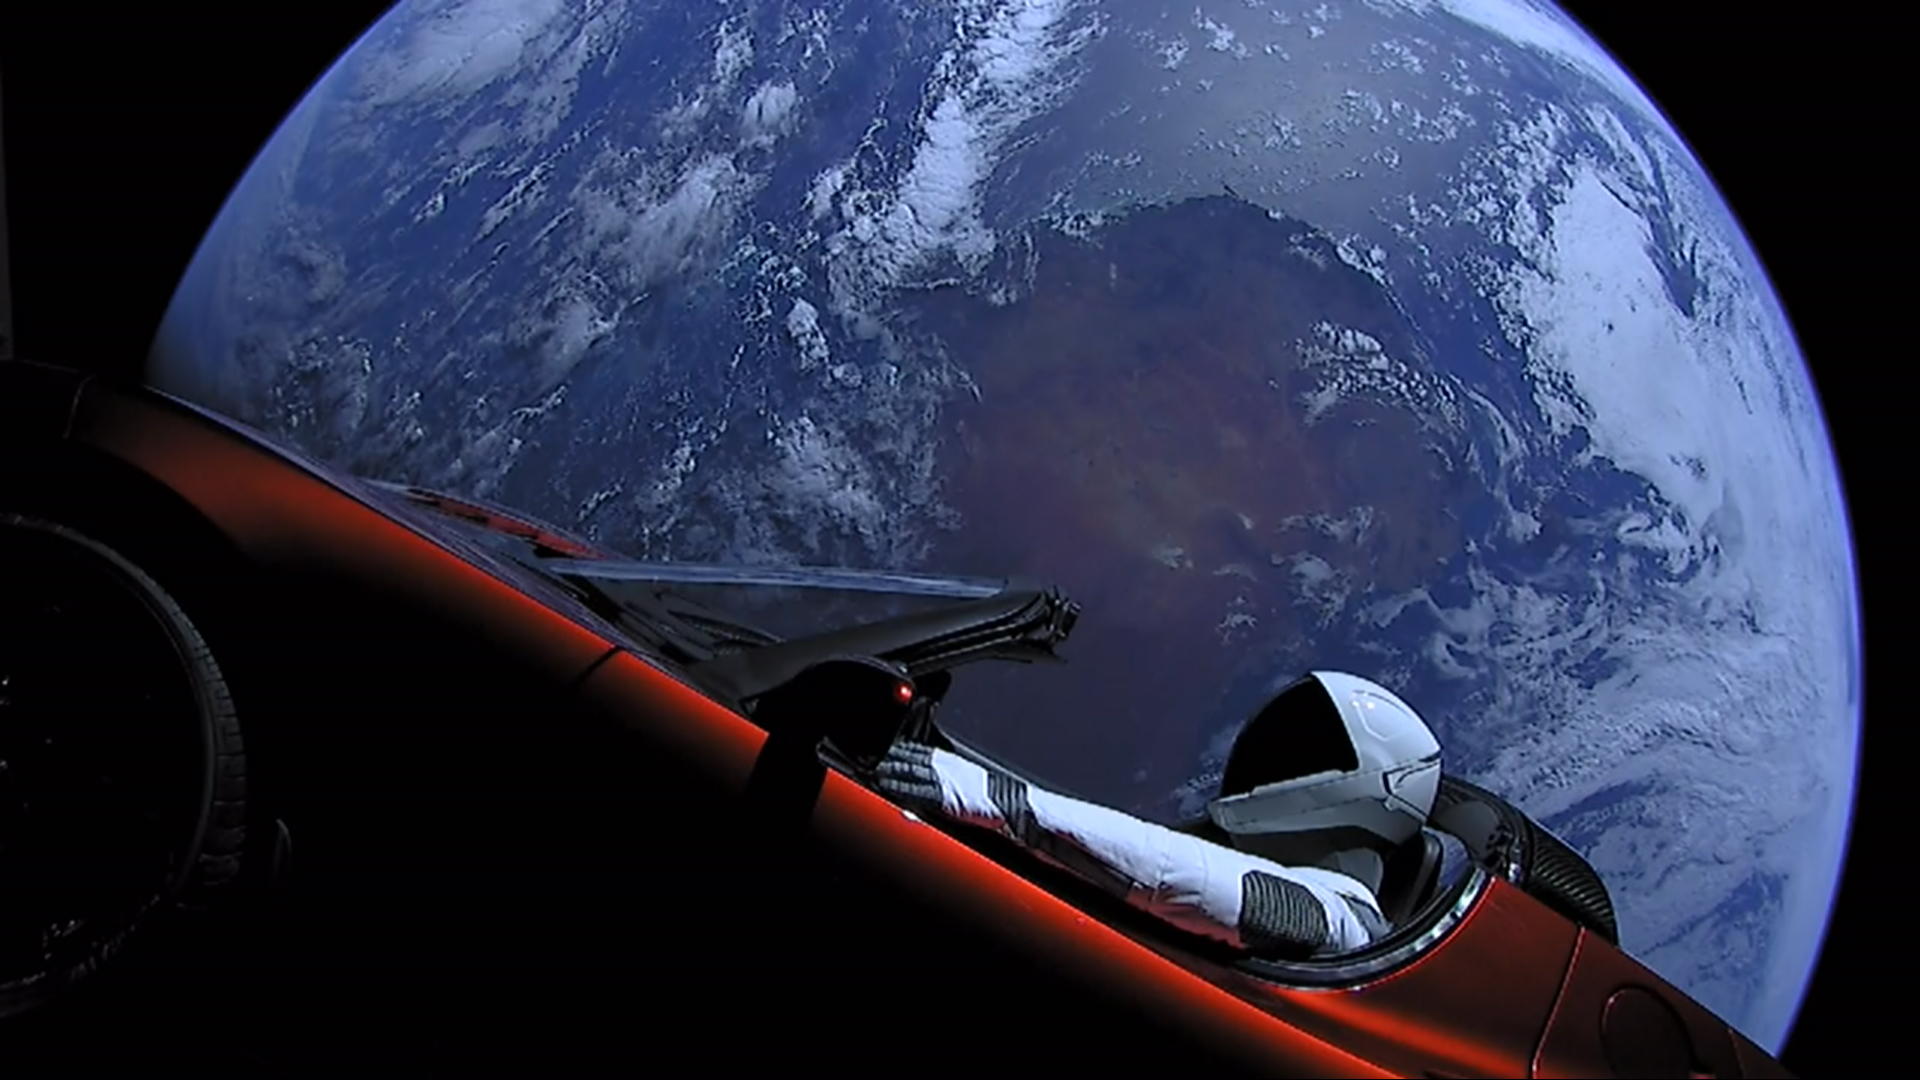 Elon_Musk's_Tesla_Roadster_(40143096241)